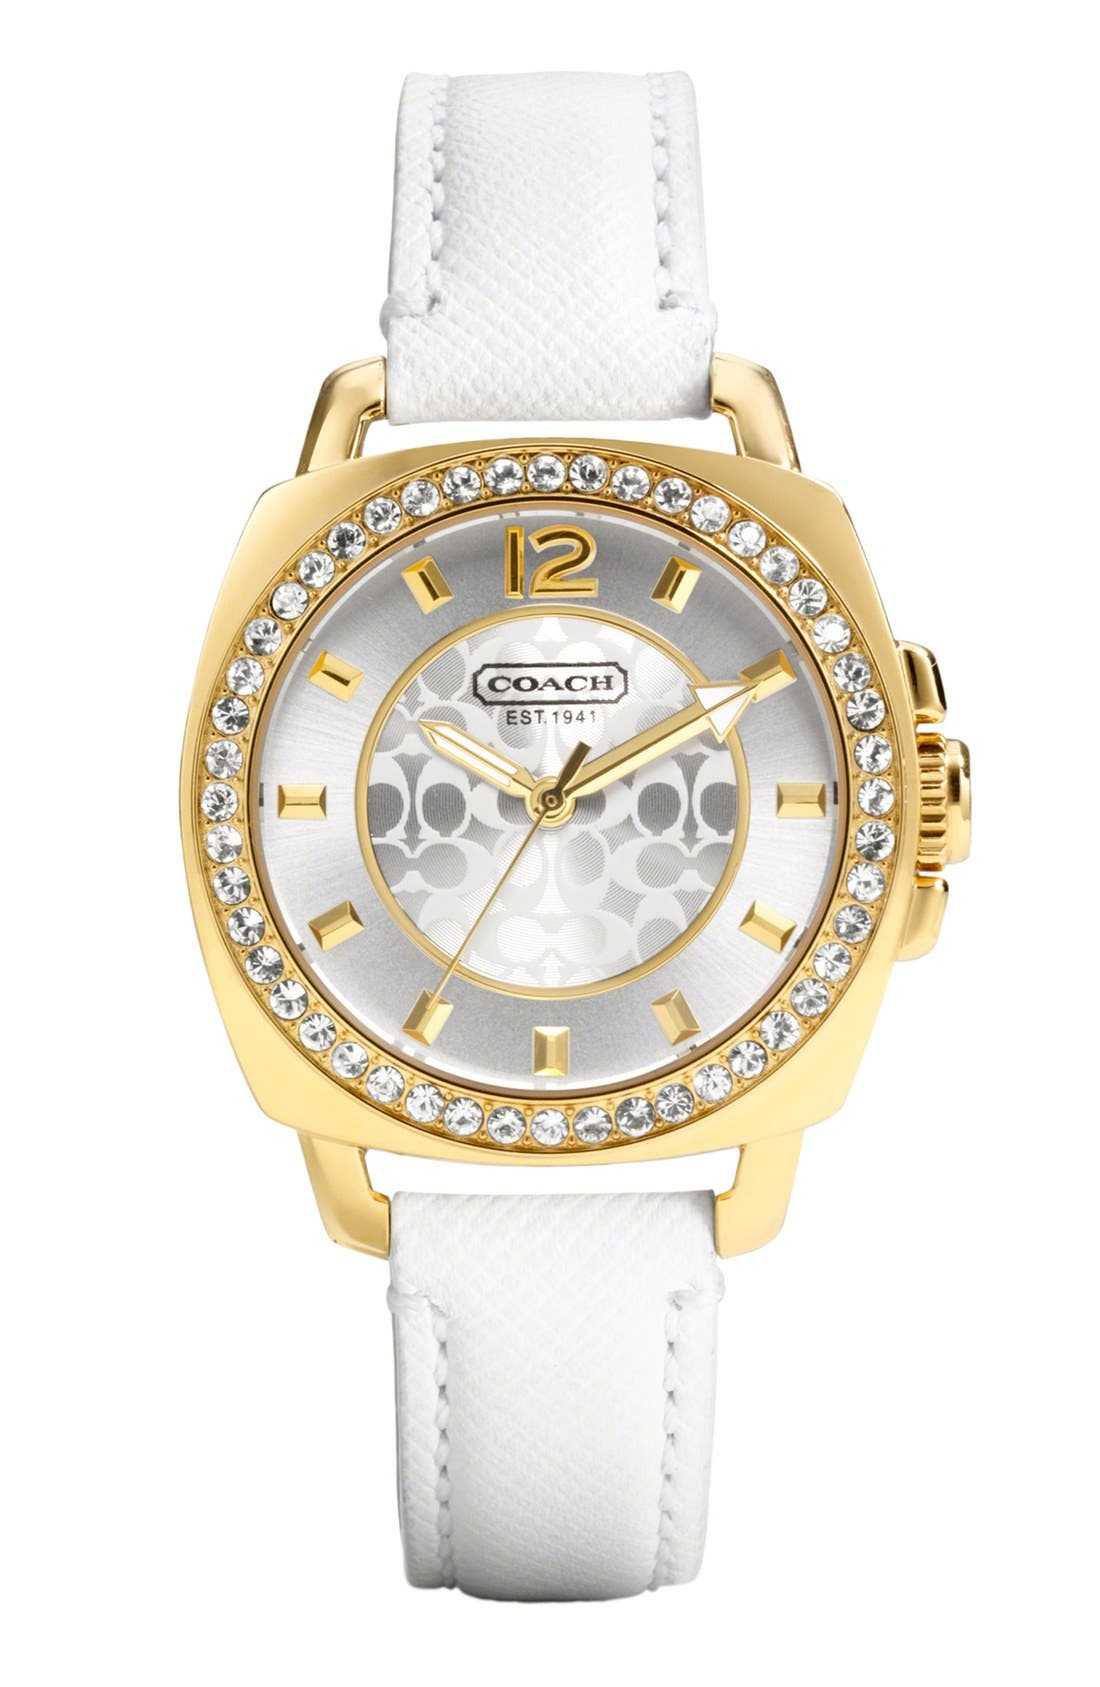 Main Image - COACH 'Boyfriend' Crystal Bezel Leather Strap Watch, 40mm